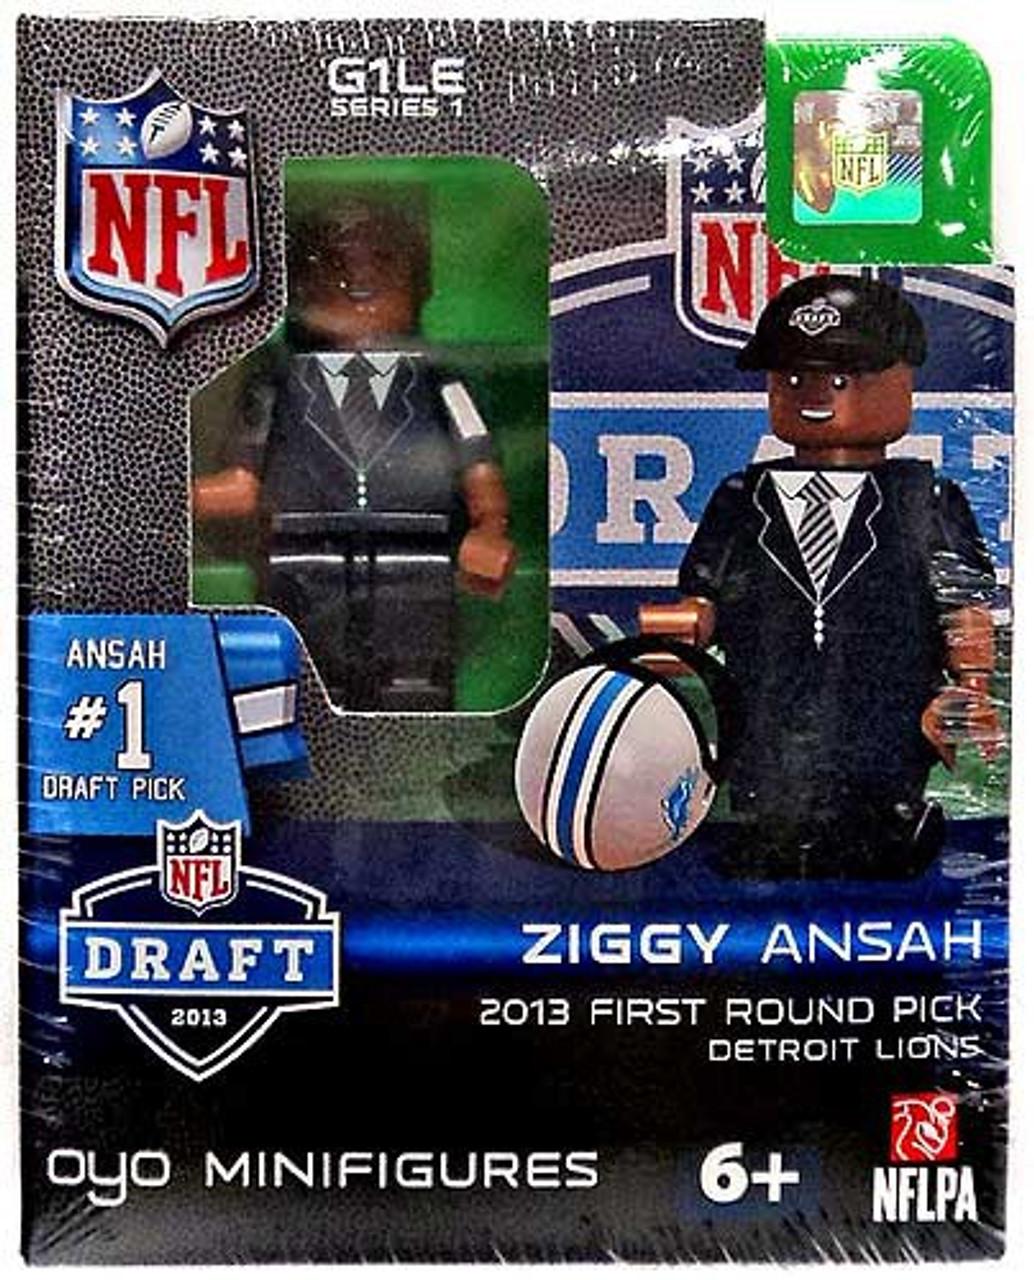 Detroit Lions NFL 2013 Draft First Round Picks Ziggy Ansah Minifigure